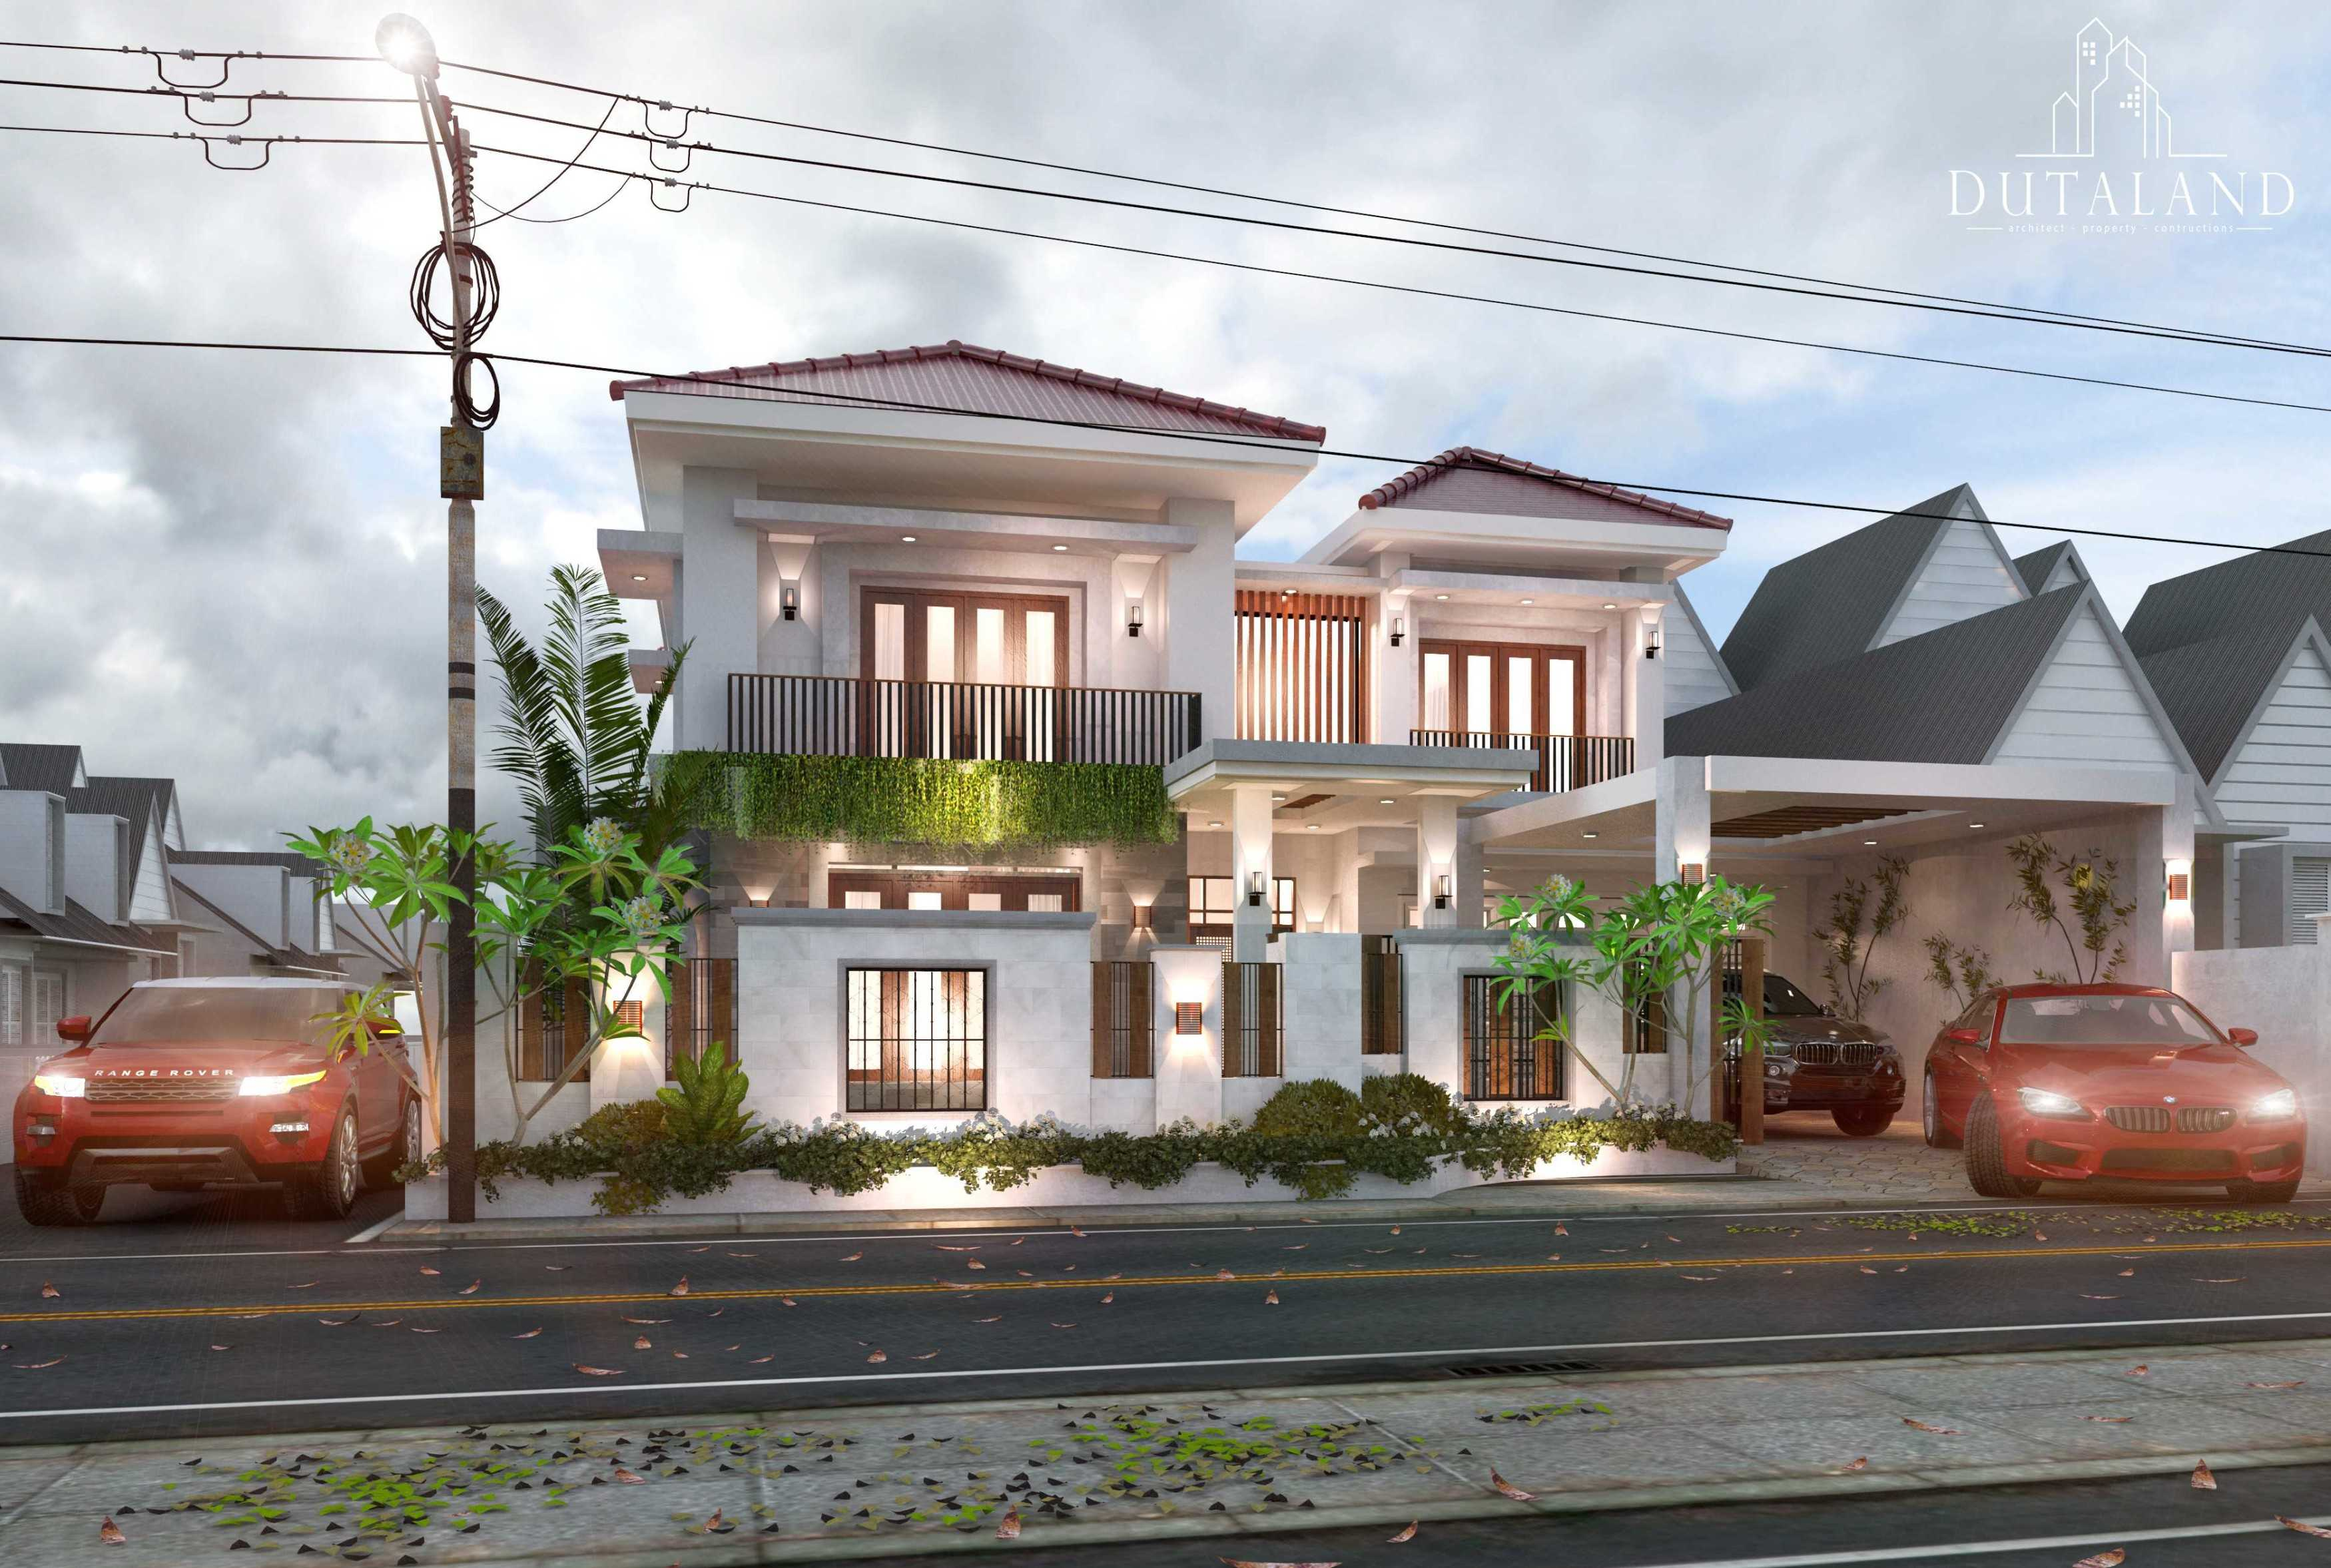 Dutaland House In Murni Medan, Kota Medan, Sumatera Utara, Indonesia Medan, Kota Medan, Sumatera Utara, Indonesia Facade Tropical  40723